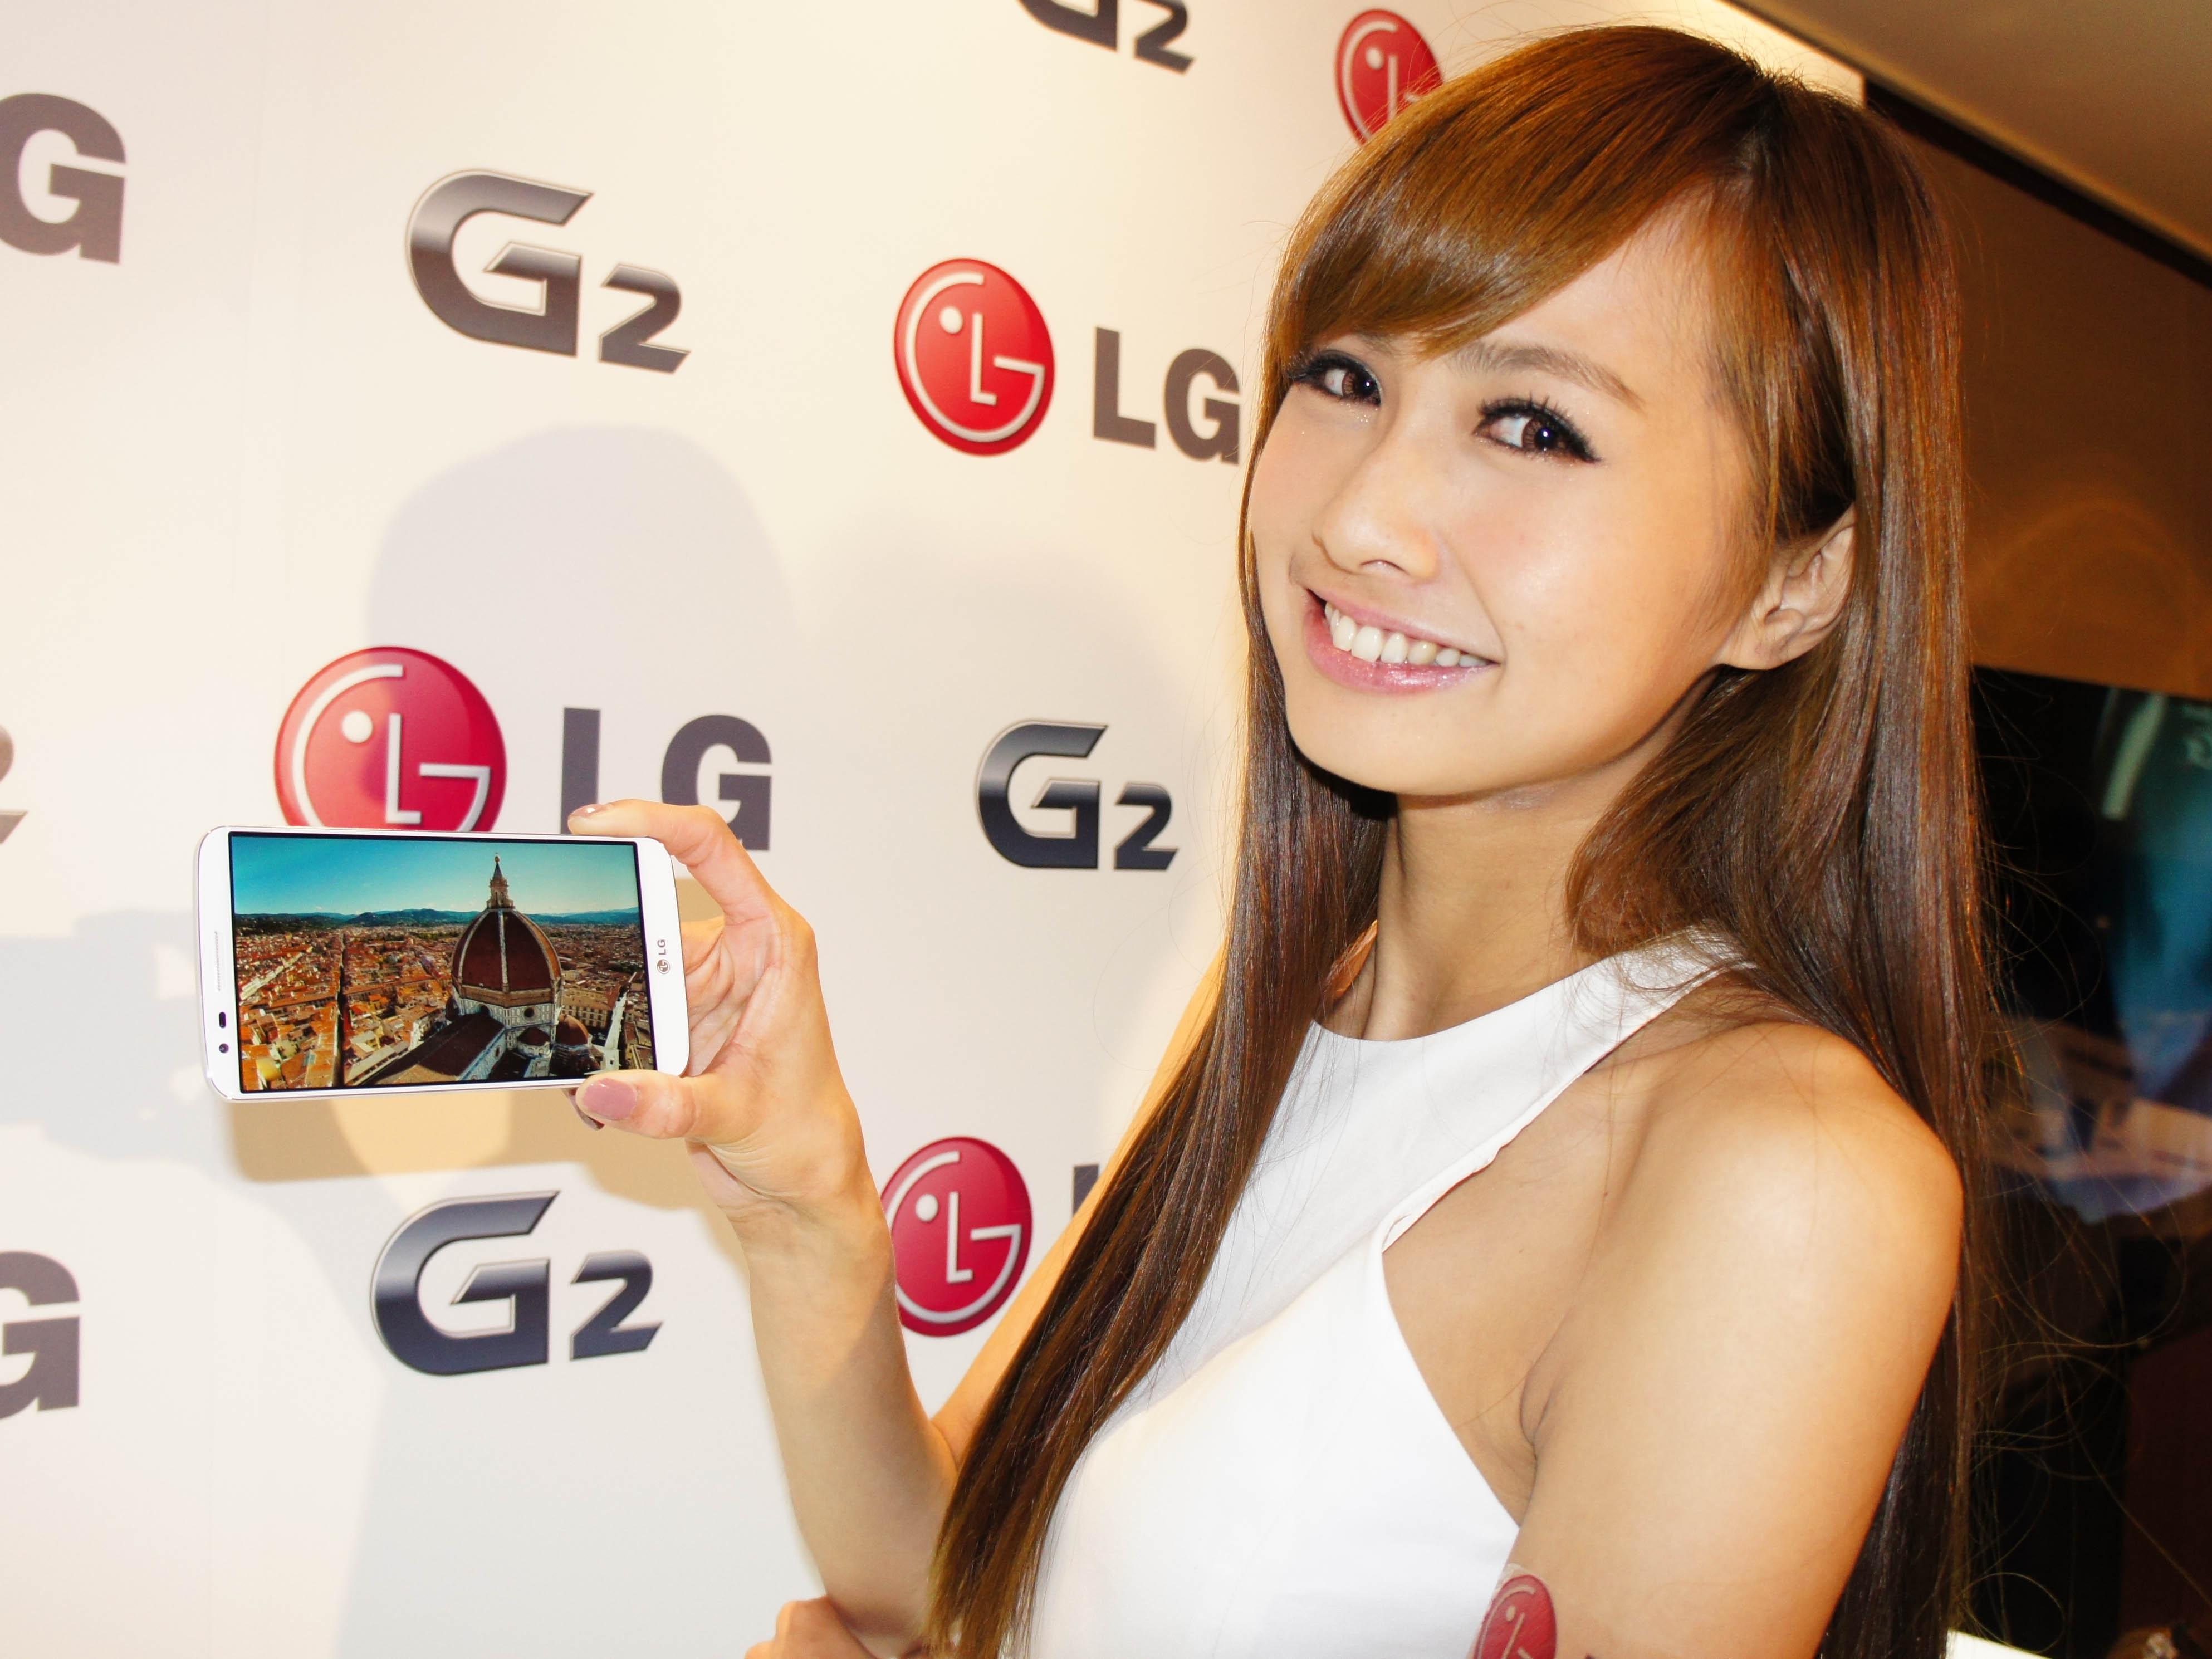 LG G2 搶先體驗: 5.2 吋超窄邊框、電源鍵及音量鍵在背面